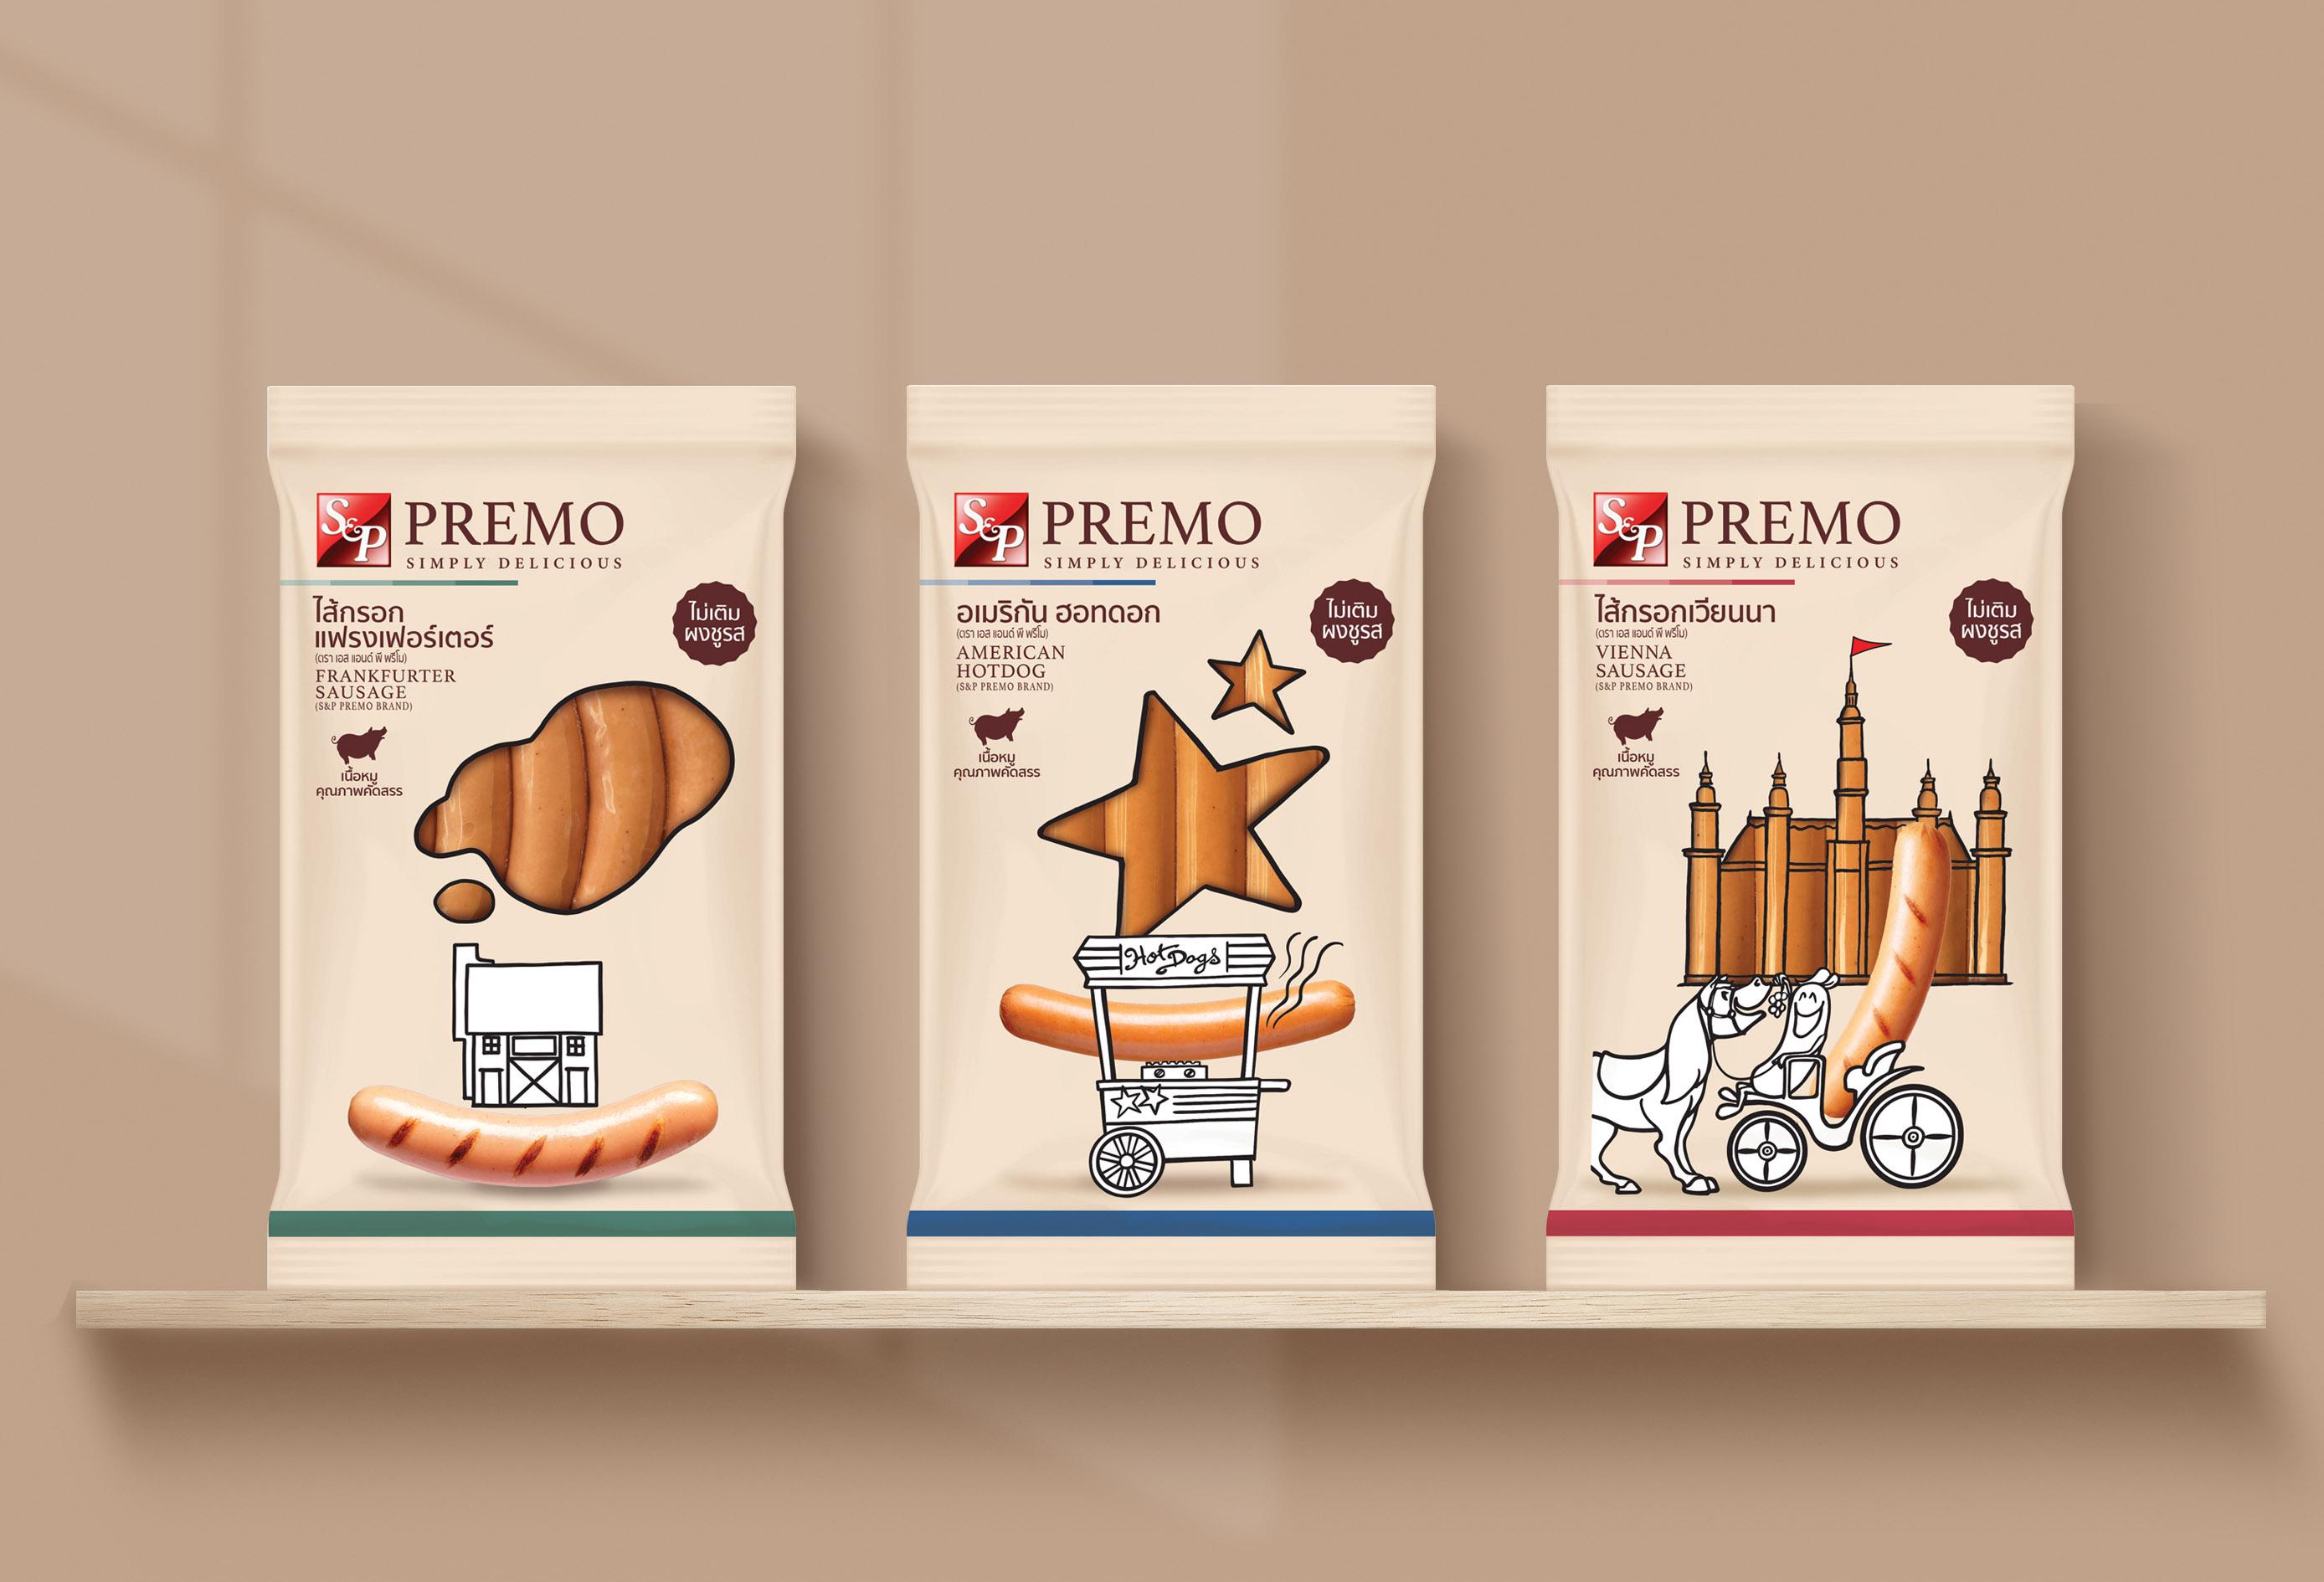 New PREMO Sausage Packaging Design